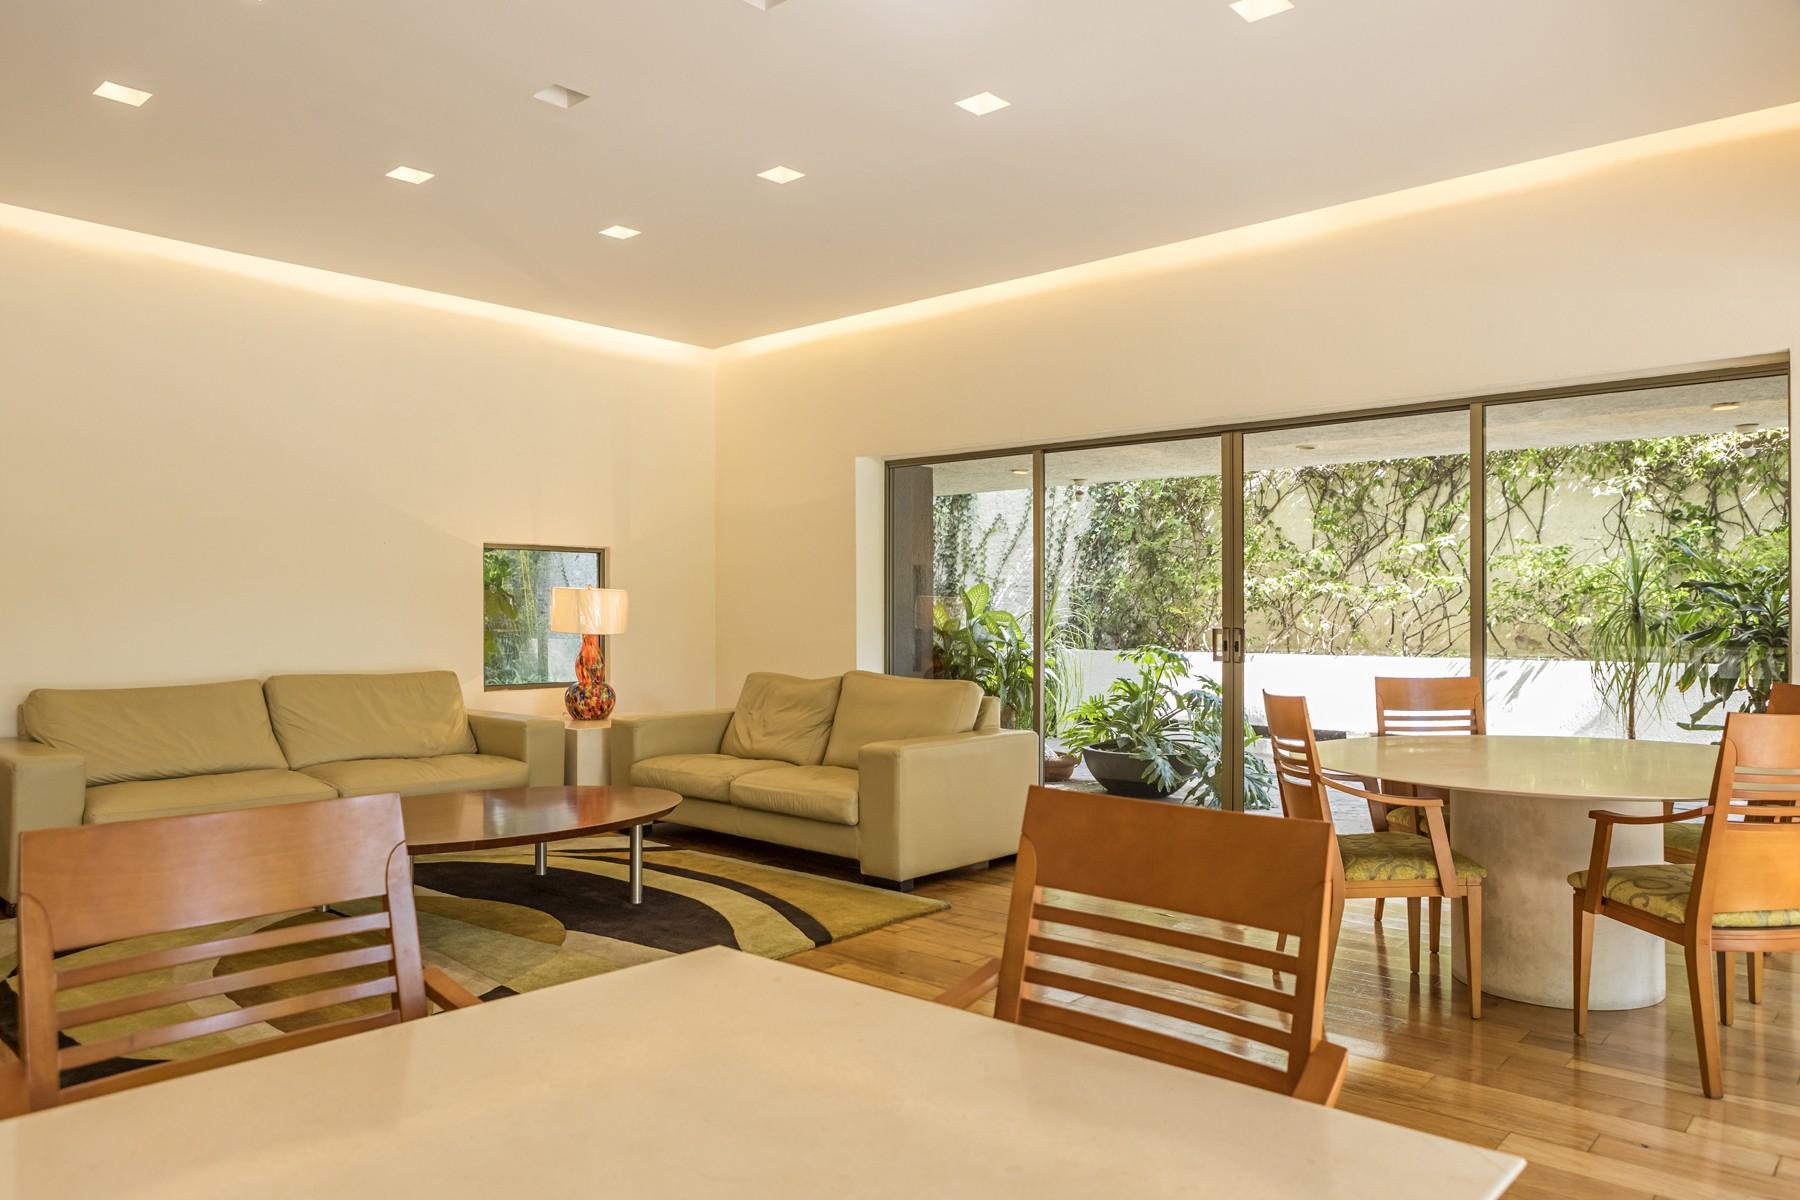 Additional photo for property listing at Piso 3, Río de la Plata, Colomos Providencia, Guadalajara. Rio de la Plata 2509 Guadalajara, Jalisco 44660 Mexico